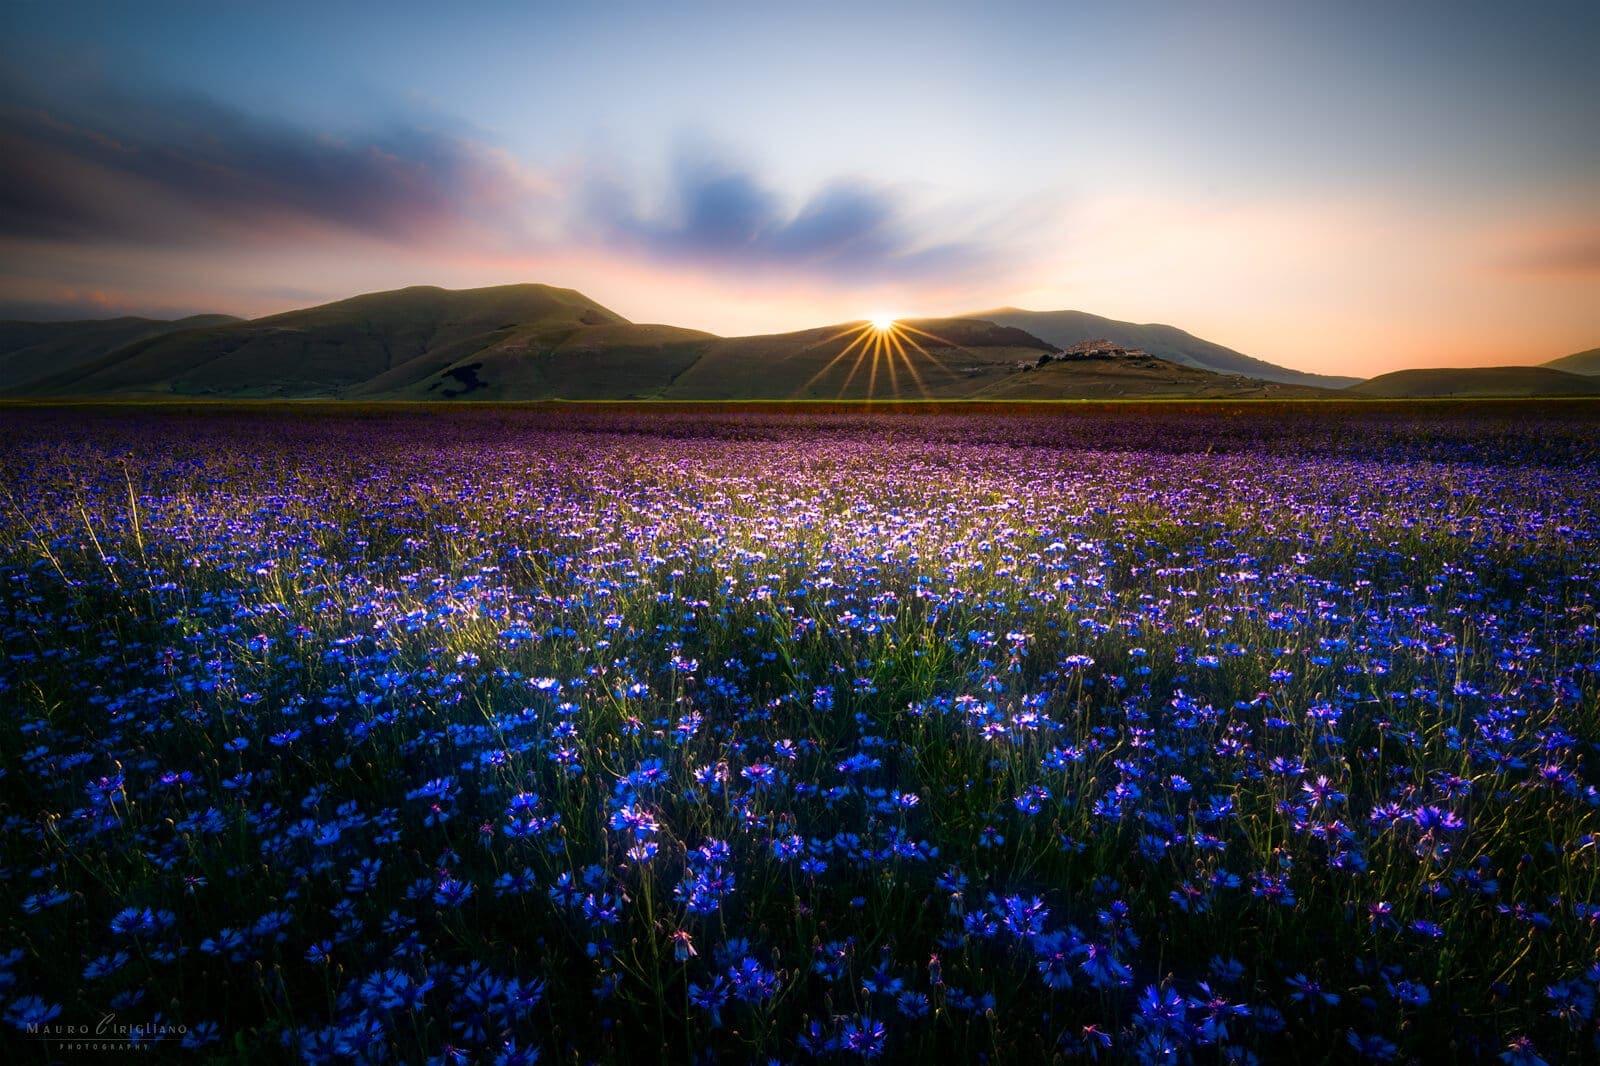 cornflowers field at sunset